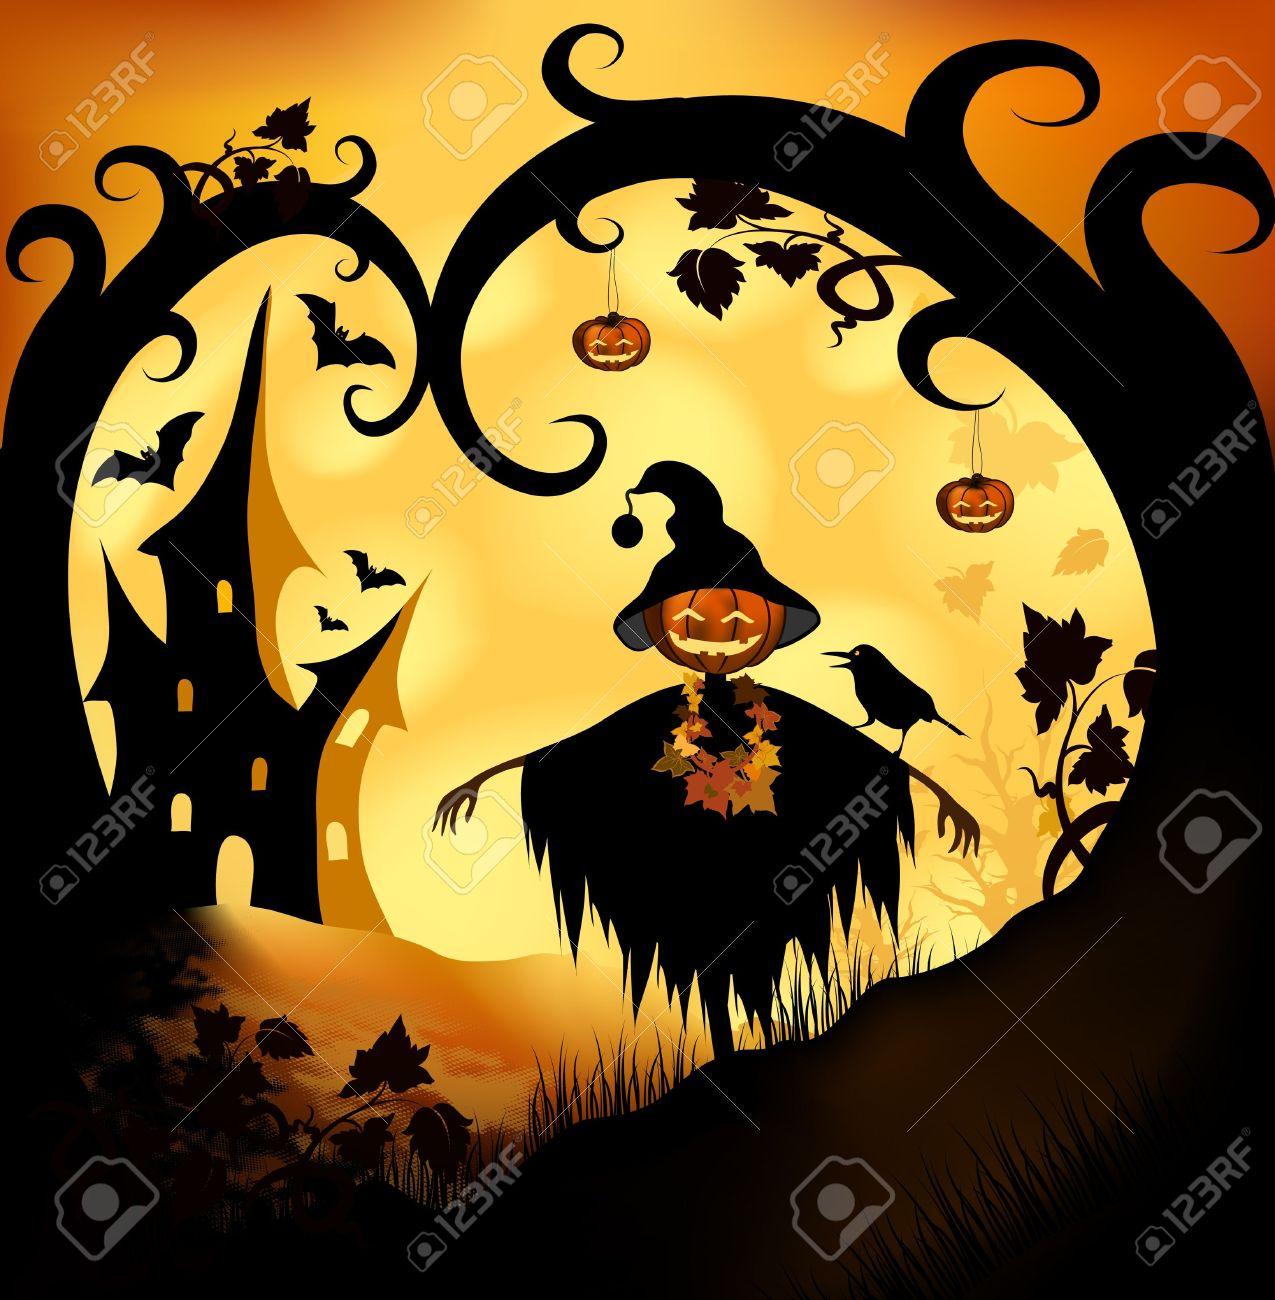 Halloween bitmap illustration background with pumpkin Stock Illustration - 10795311